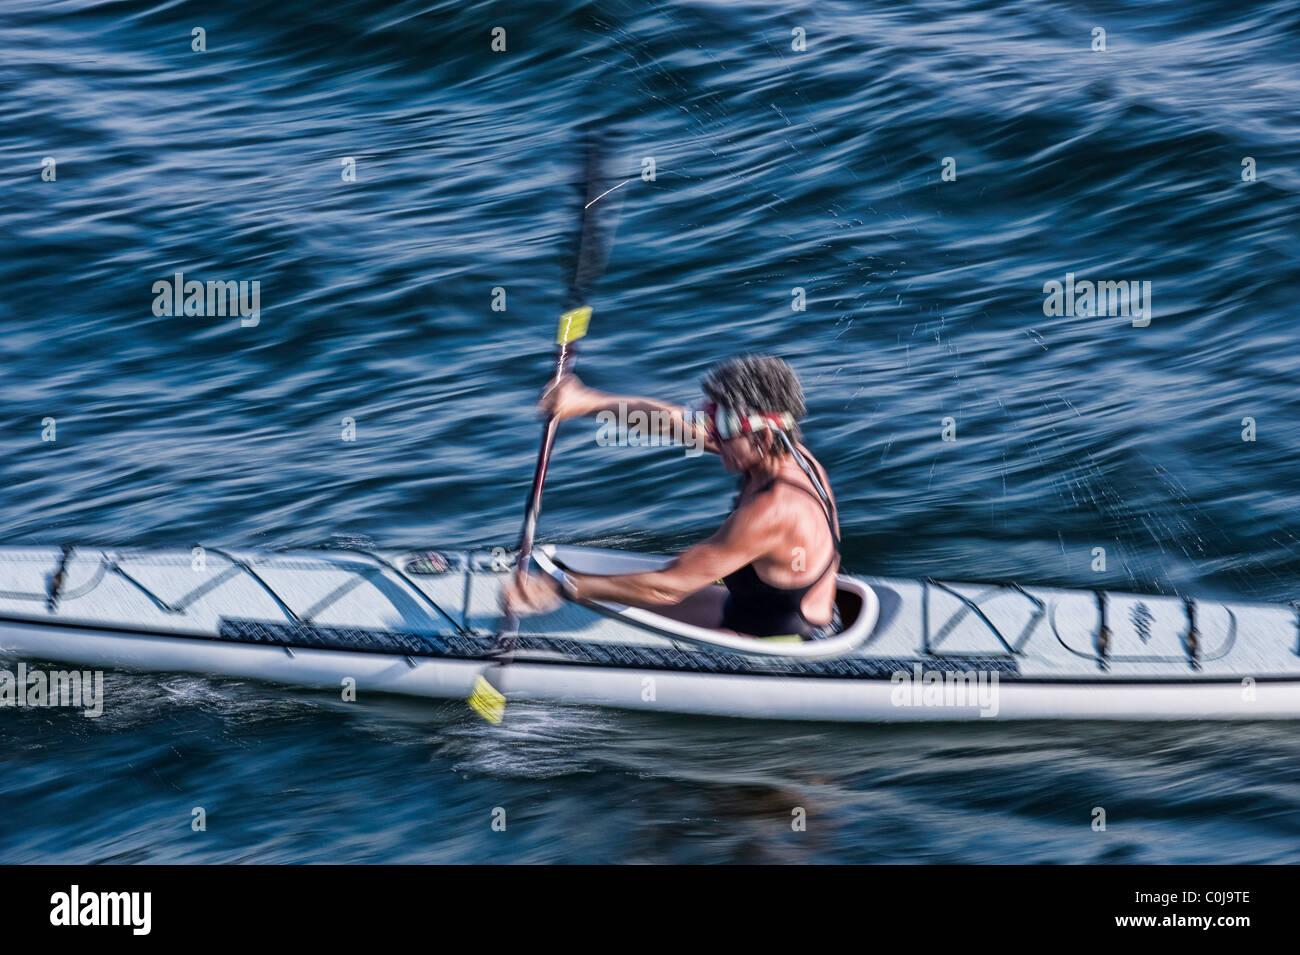 Person kayaking on Lake Union, Seattle, Washington, USA - Stock Image